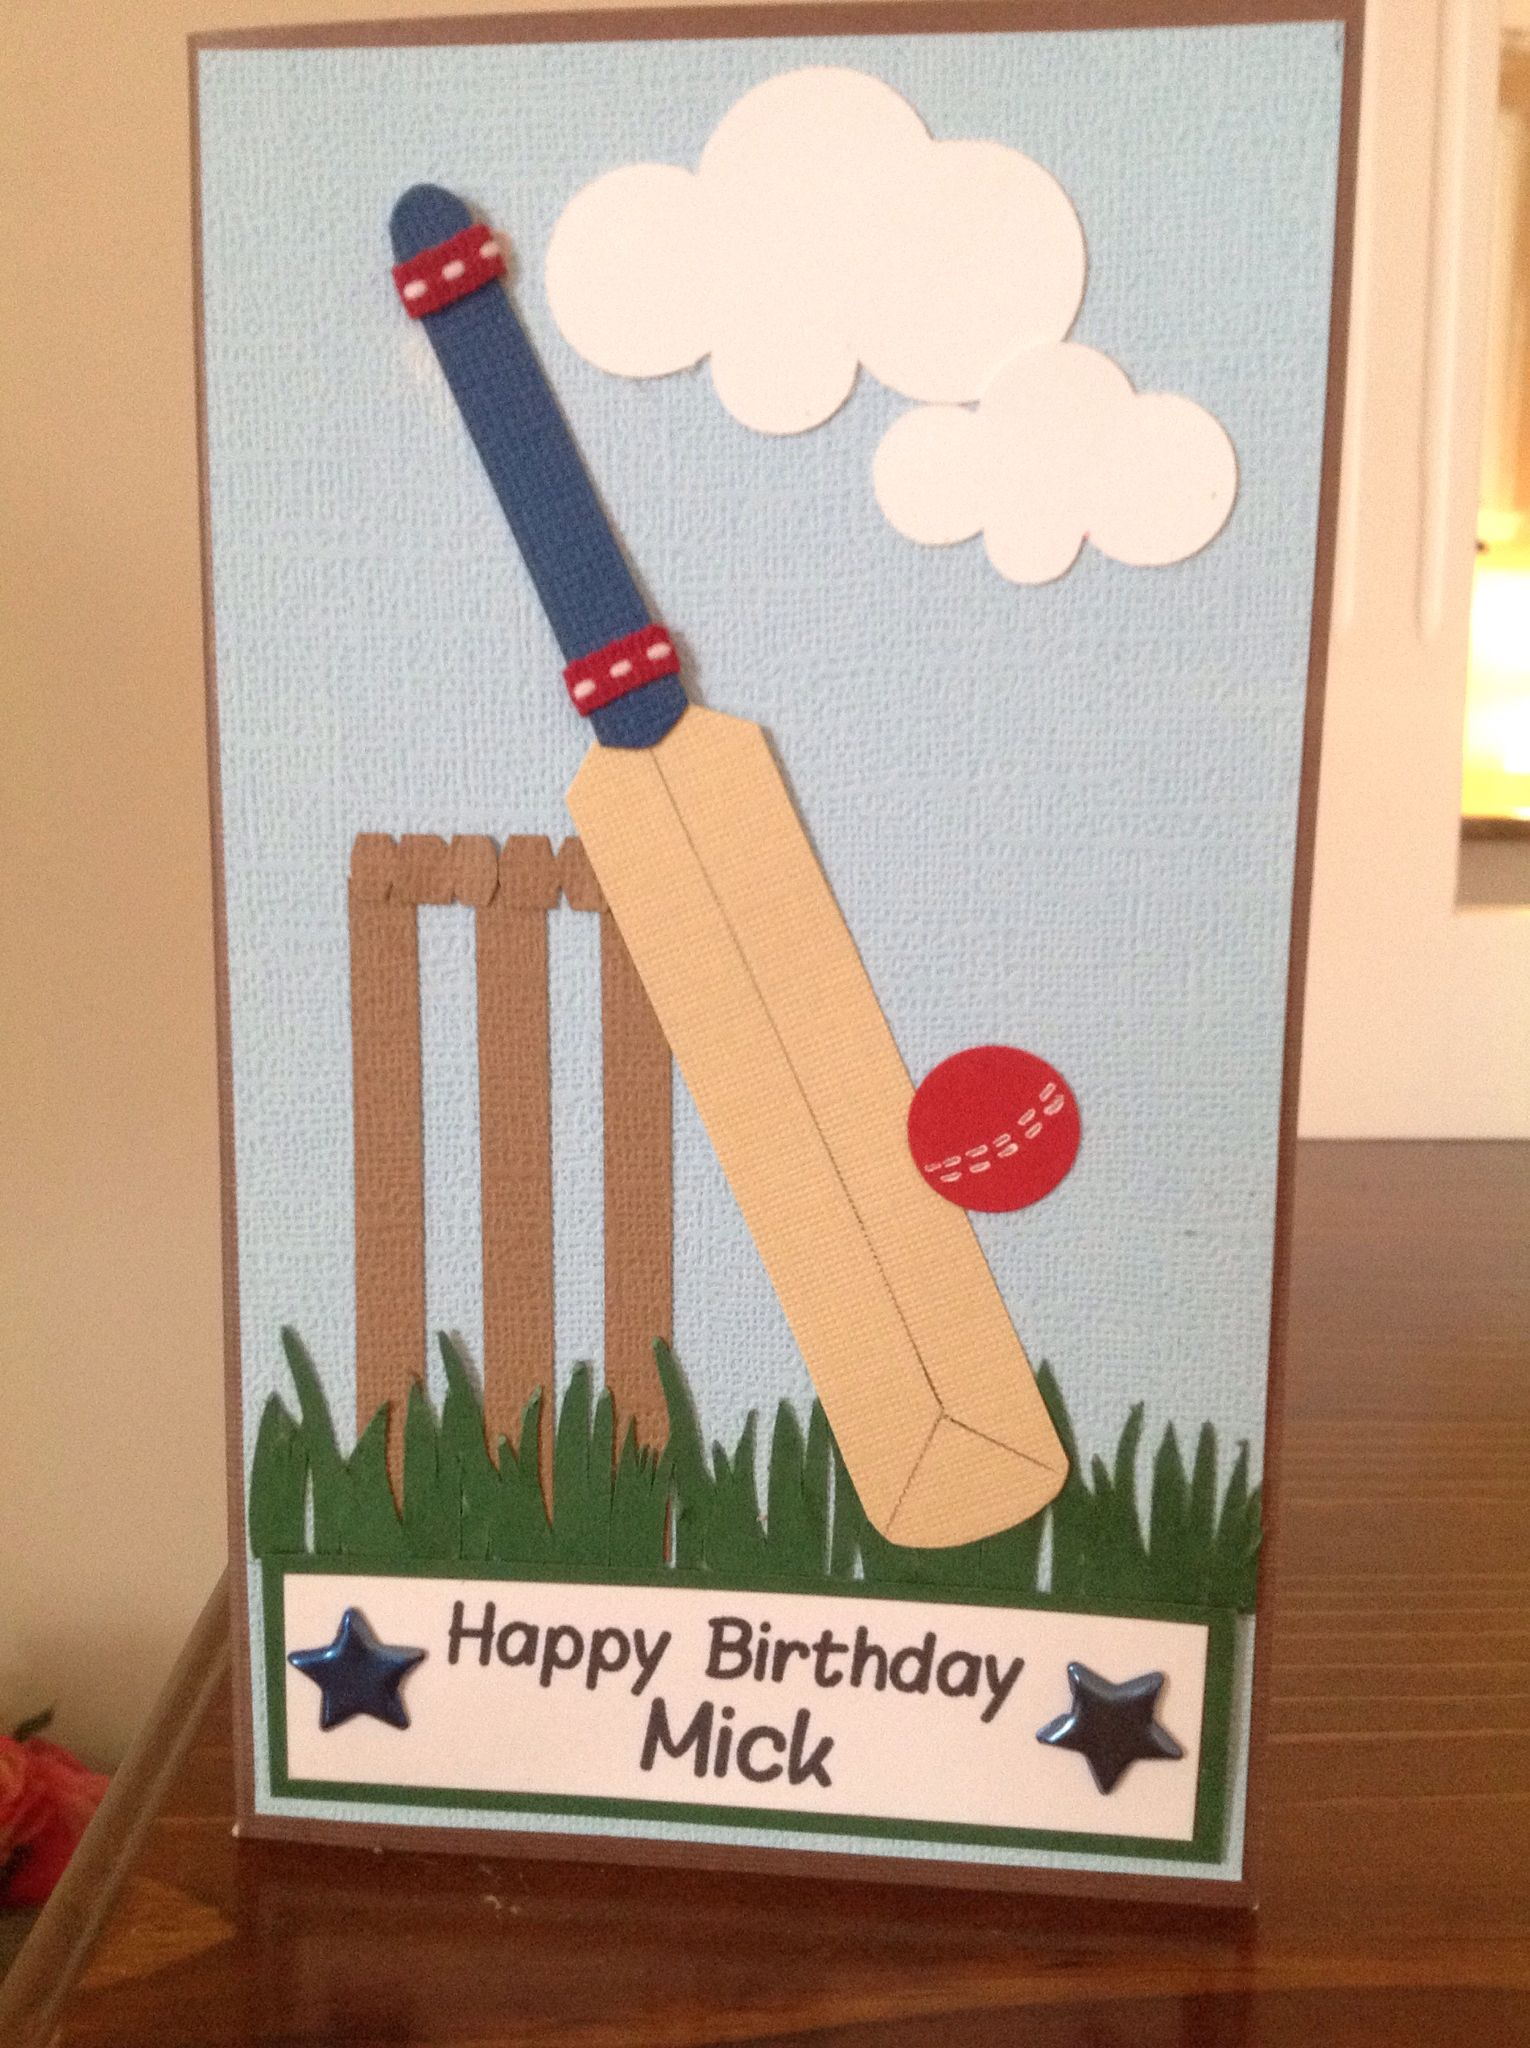 Cricket Bat Punch Art Card Birthday Cards For Boys Birthday